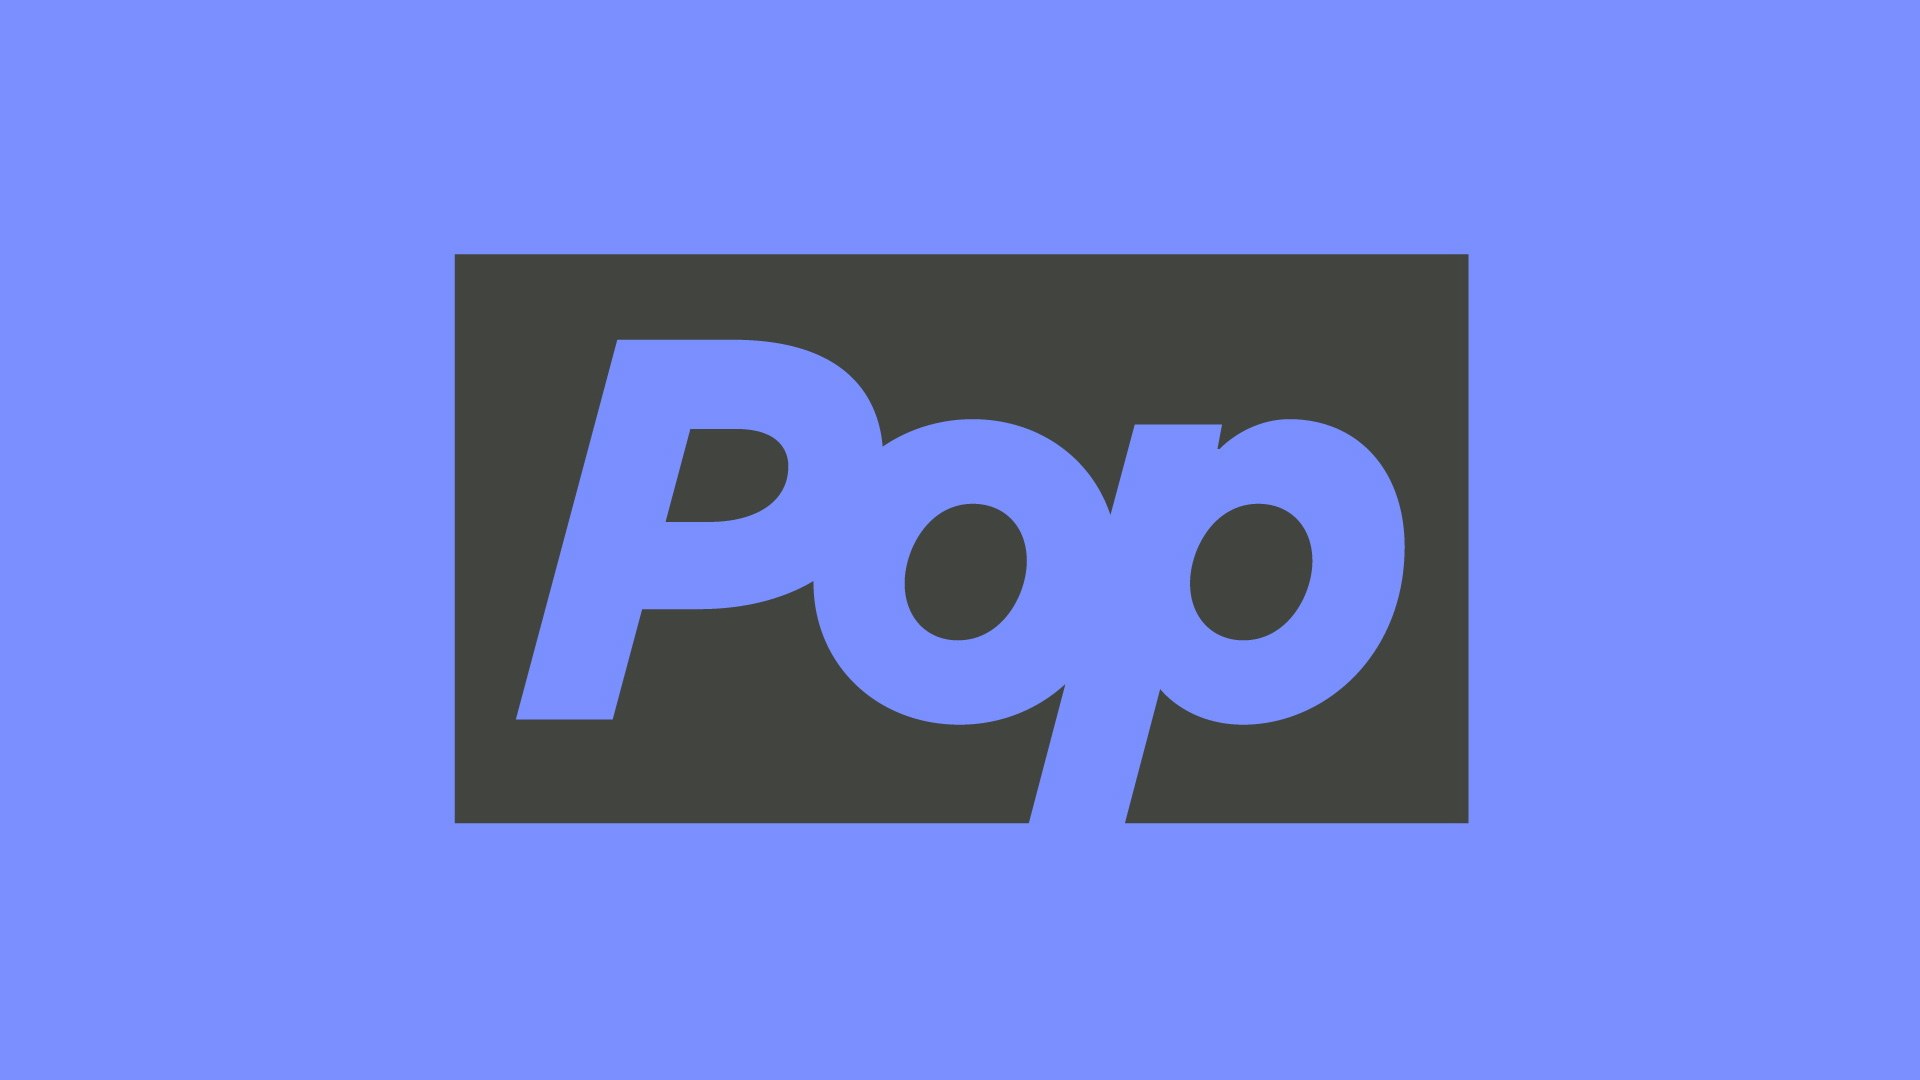 THEPRINCESSBRIDE_Pop_01.jpg